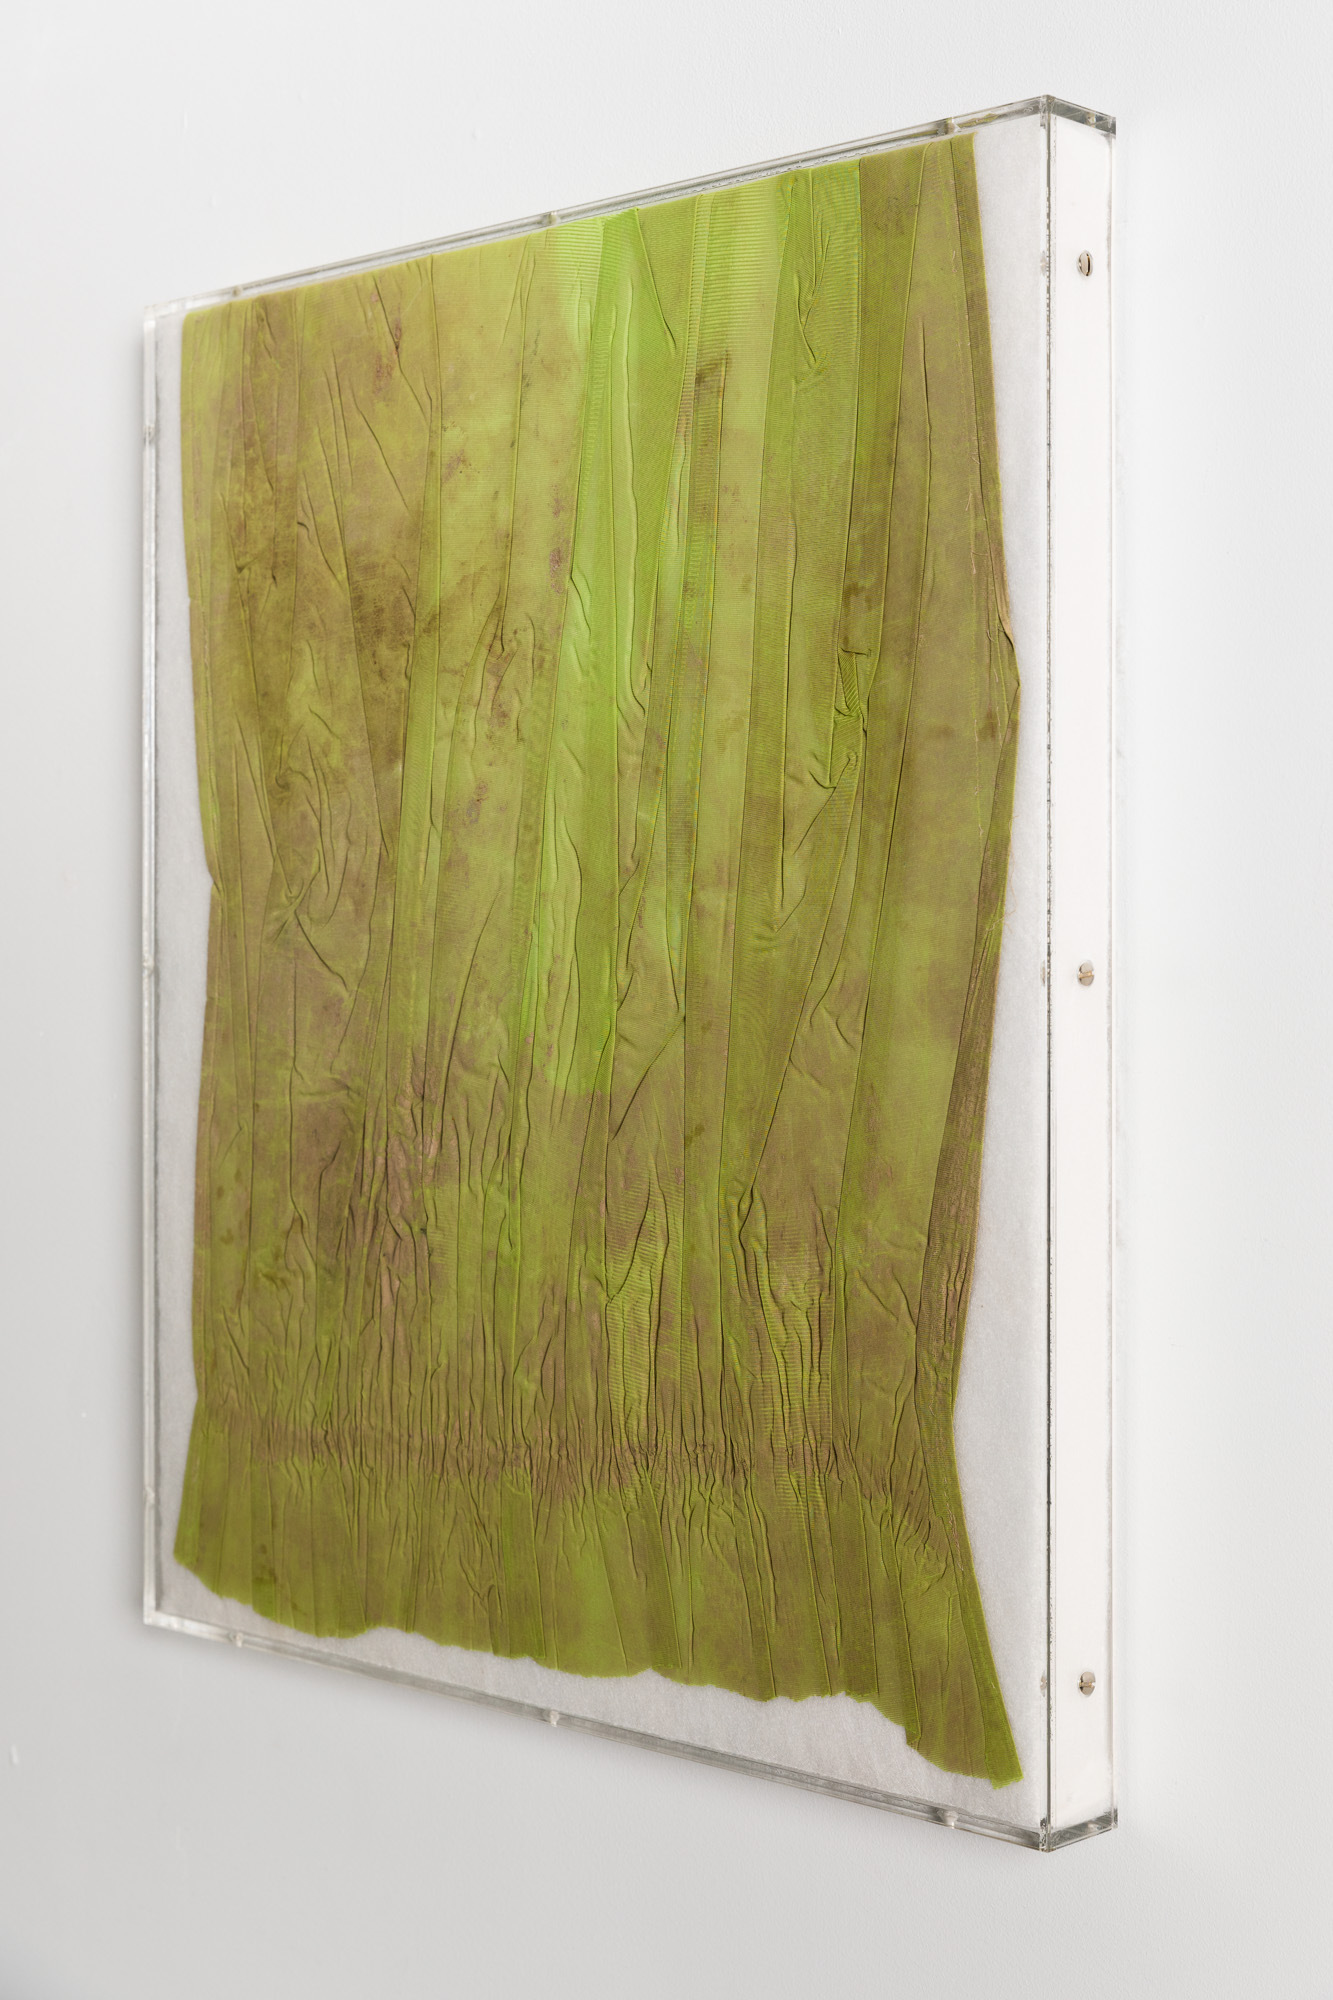 Minimal Information Curtain, 2020. Textiles in artist's frame (plexiglass, wood and aluminum), 66,5 x 56,5 x 4,5 cm